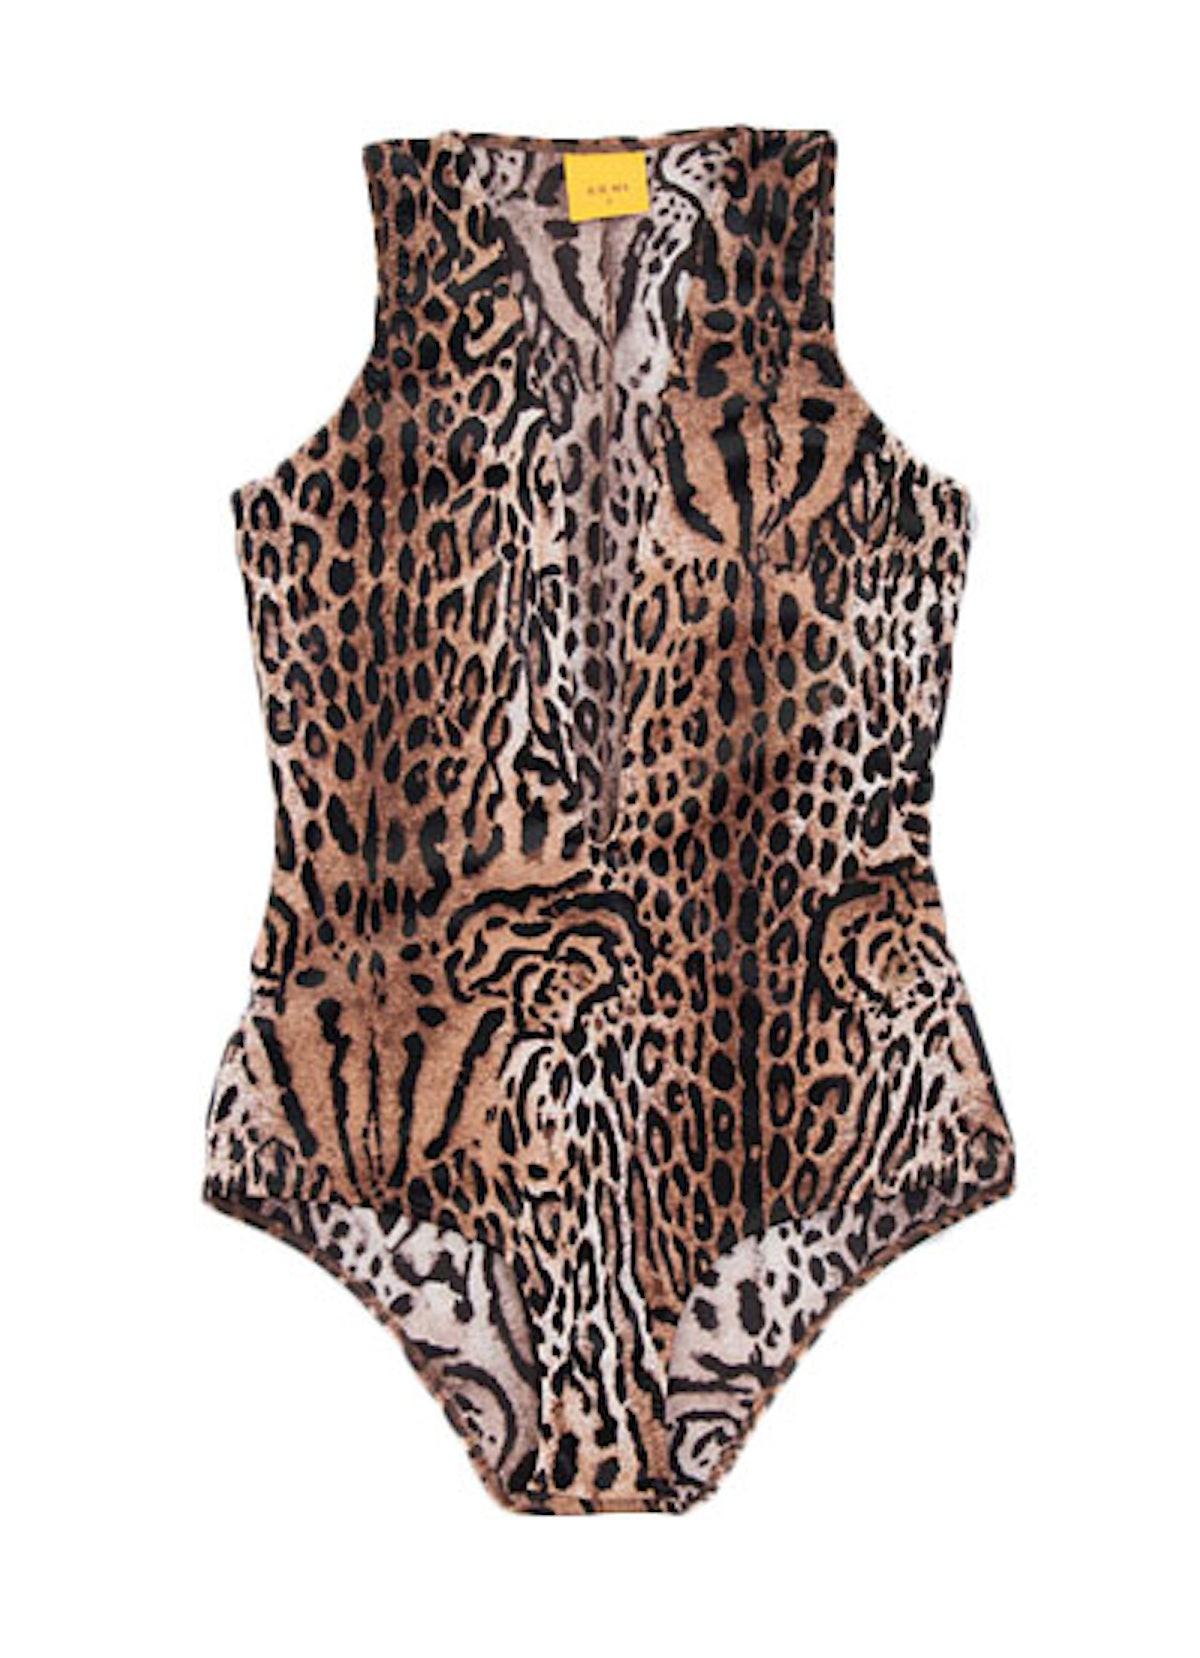 fass-animal-print-swimwear-trend-09-v.jpg